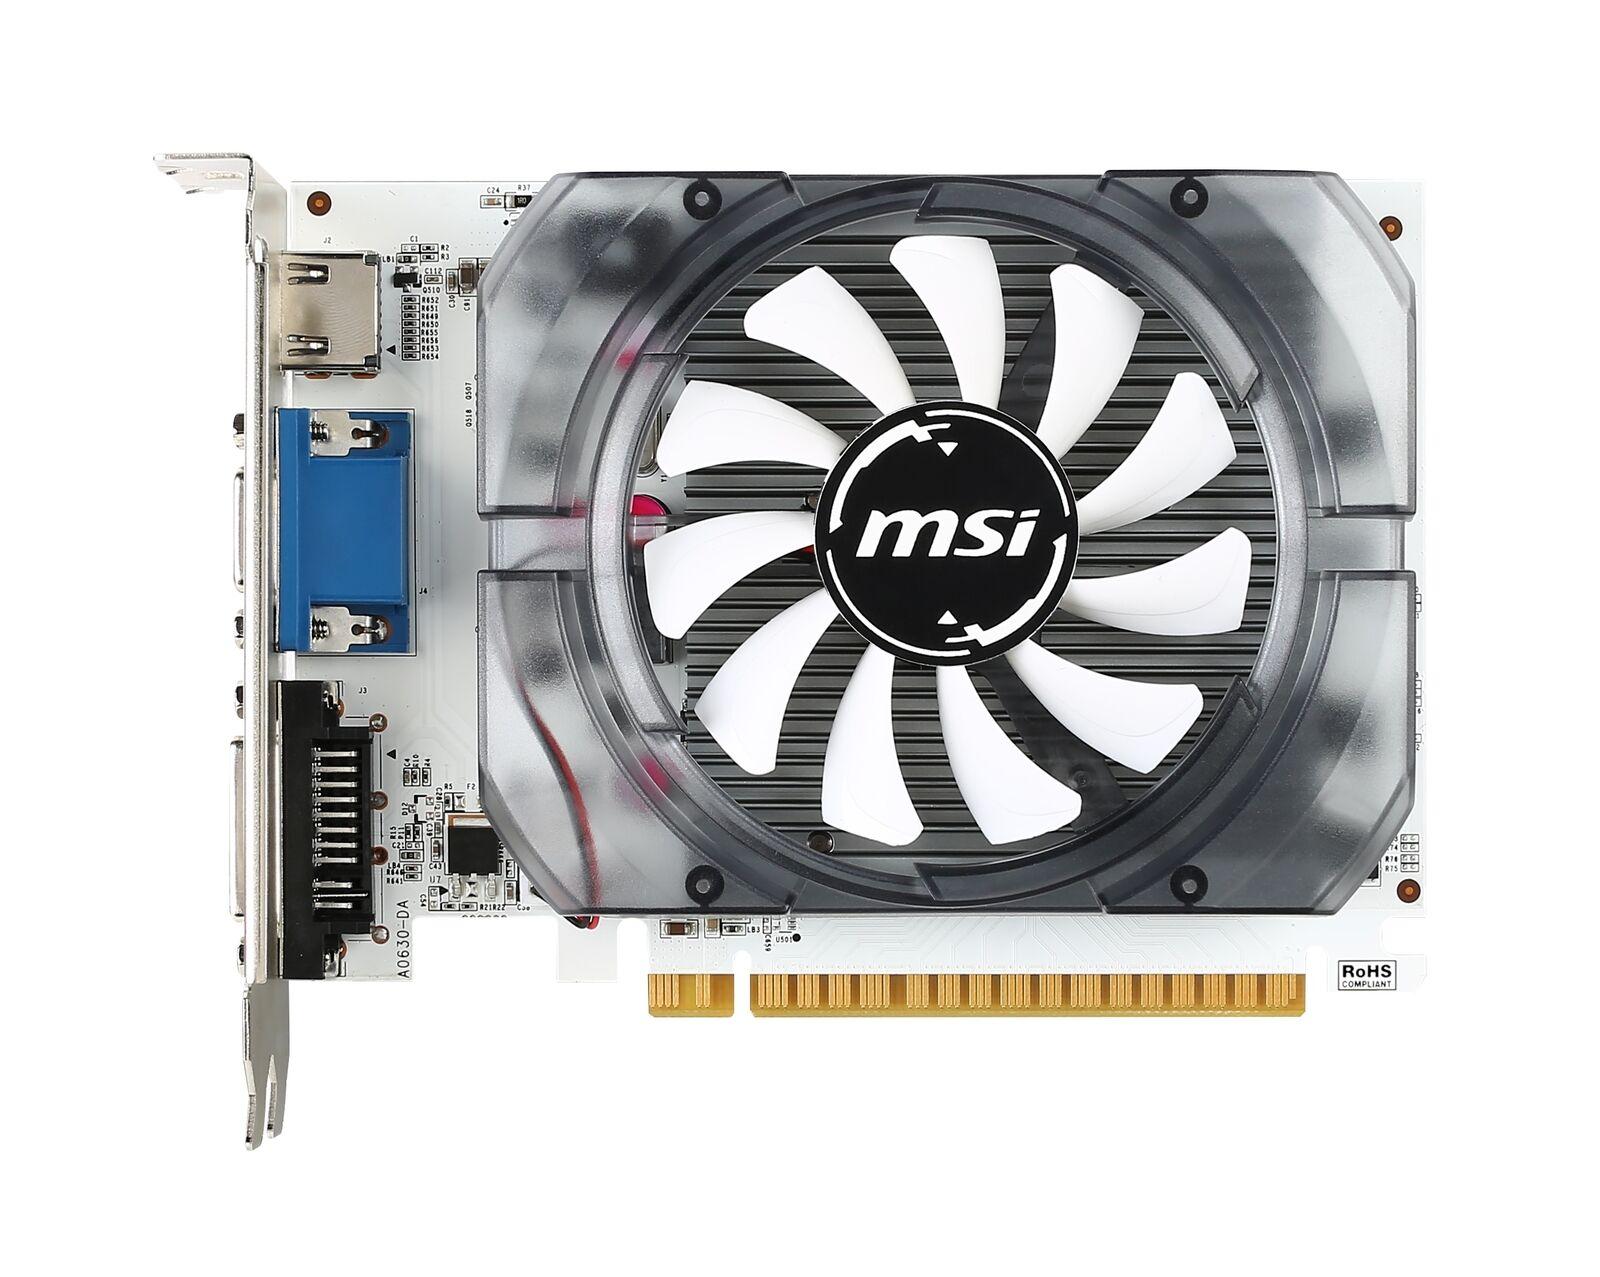 [REFURBISHED] MSI GeForce N730-4GD3V2 Graphics Card, PCI-E 2.0, DVI, HDMI, D-Sub